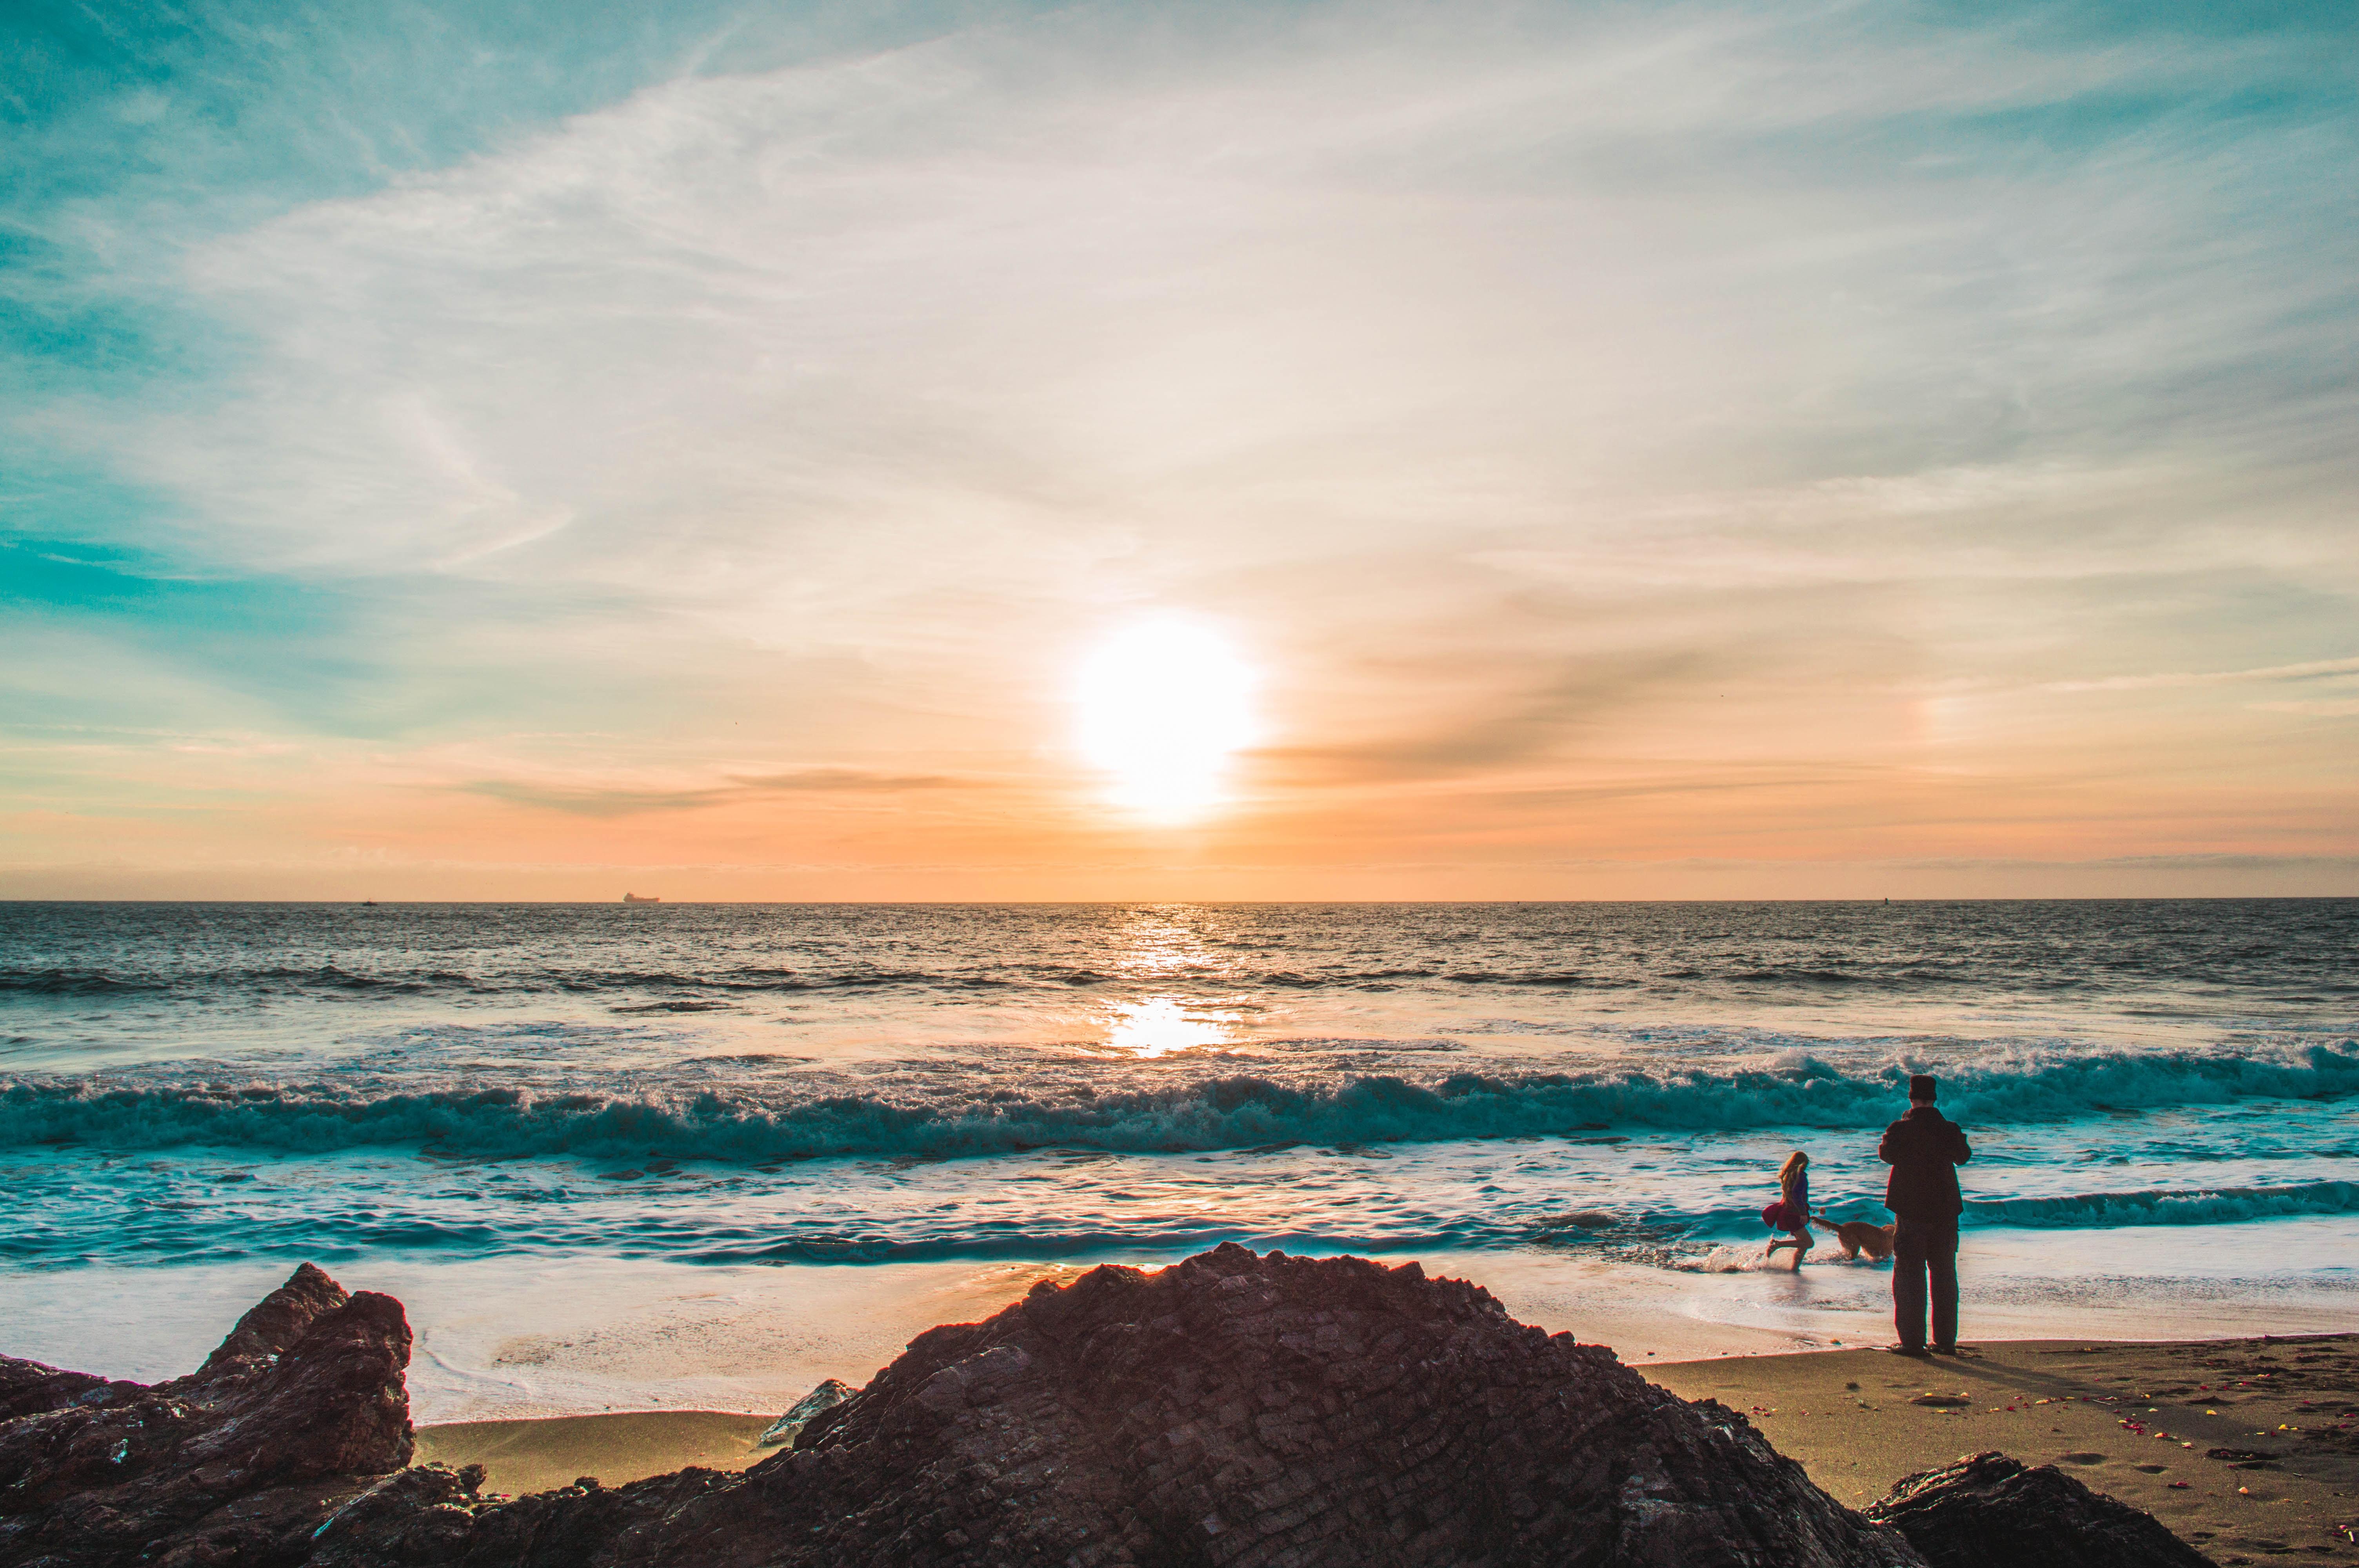 Hondvriendelijke strandvakanties